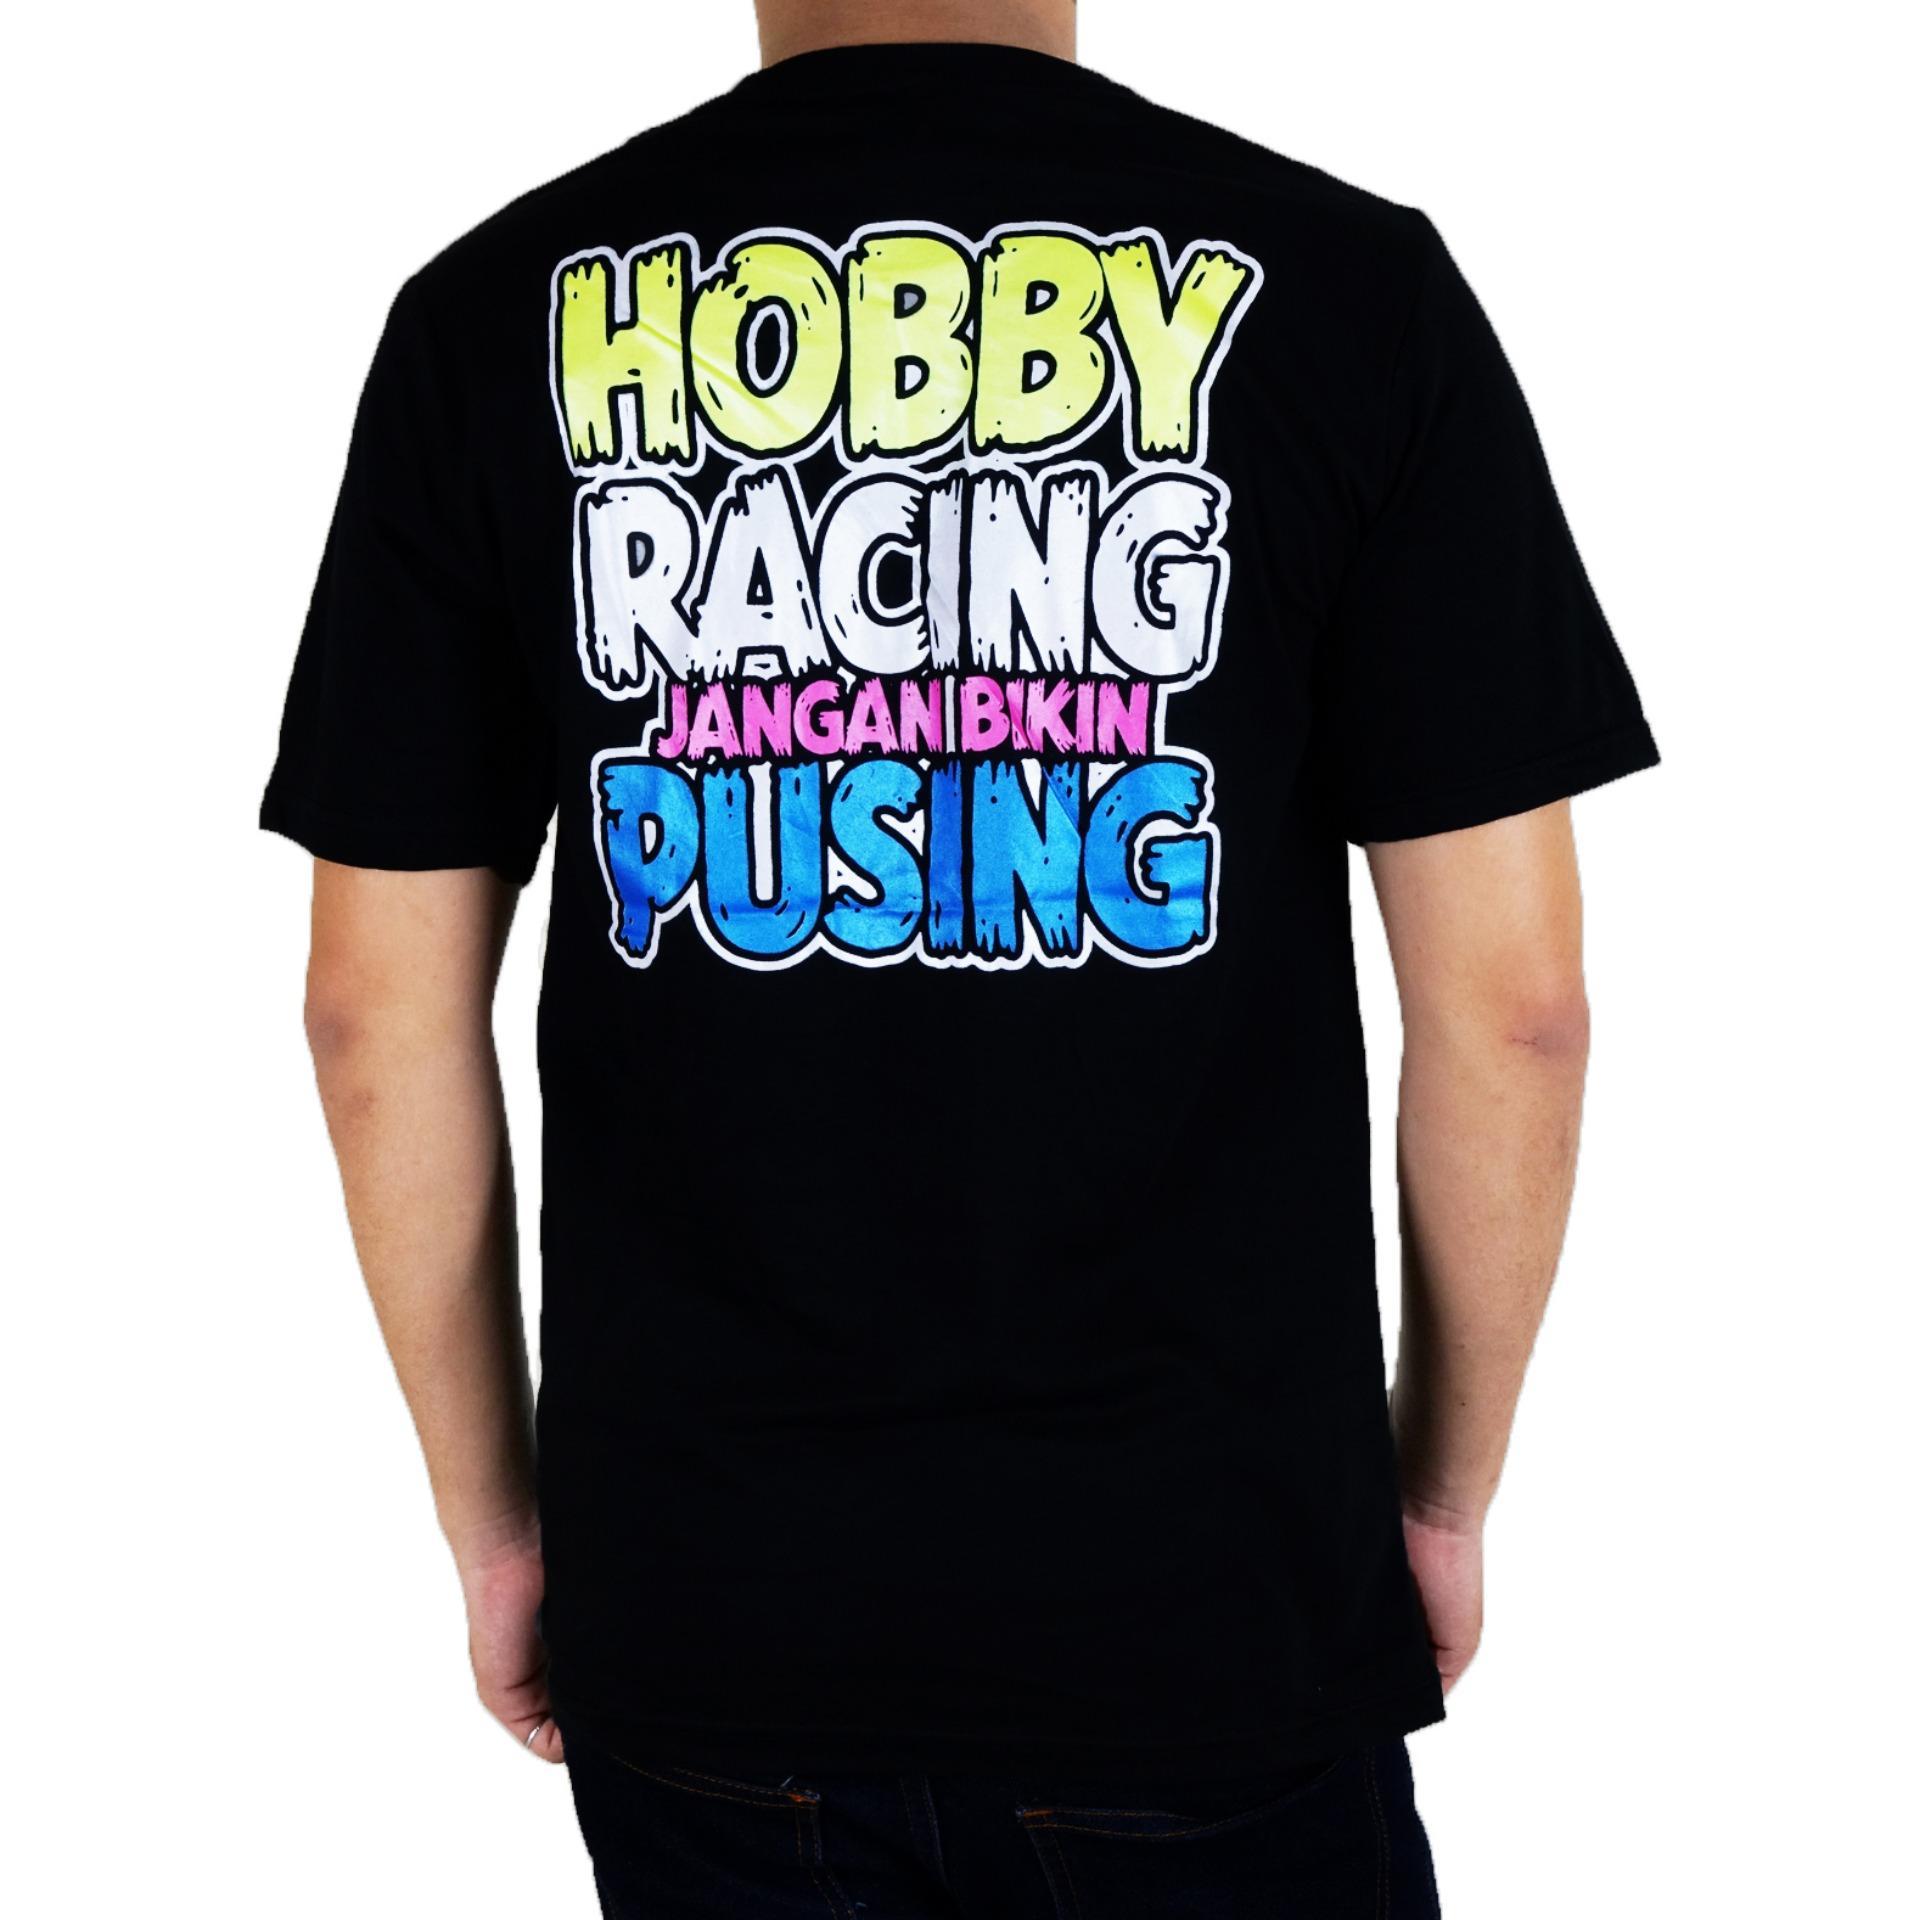 Detail Gambar Vanwin - Kaos T-Shirt Distro / kaos Pria / Tshirt Pria / Distro Pria / Baju Pria Premium Racing Tukang Gaspoll - Hitam Terbaru